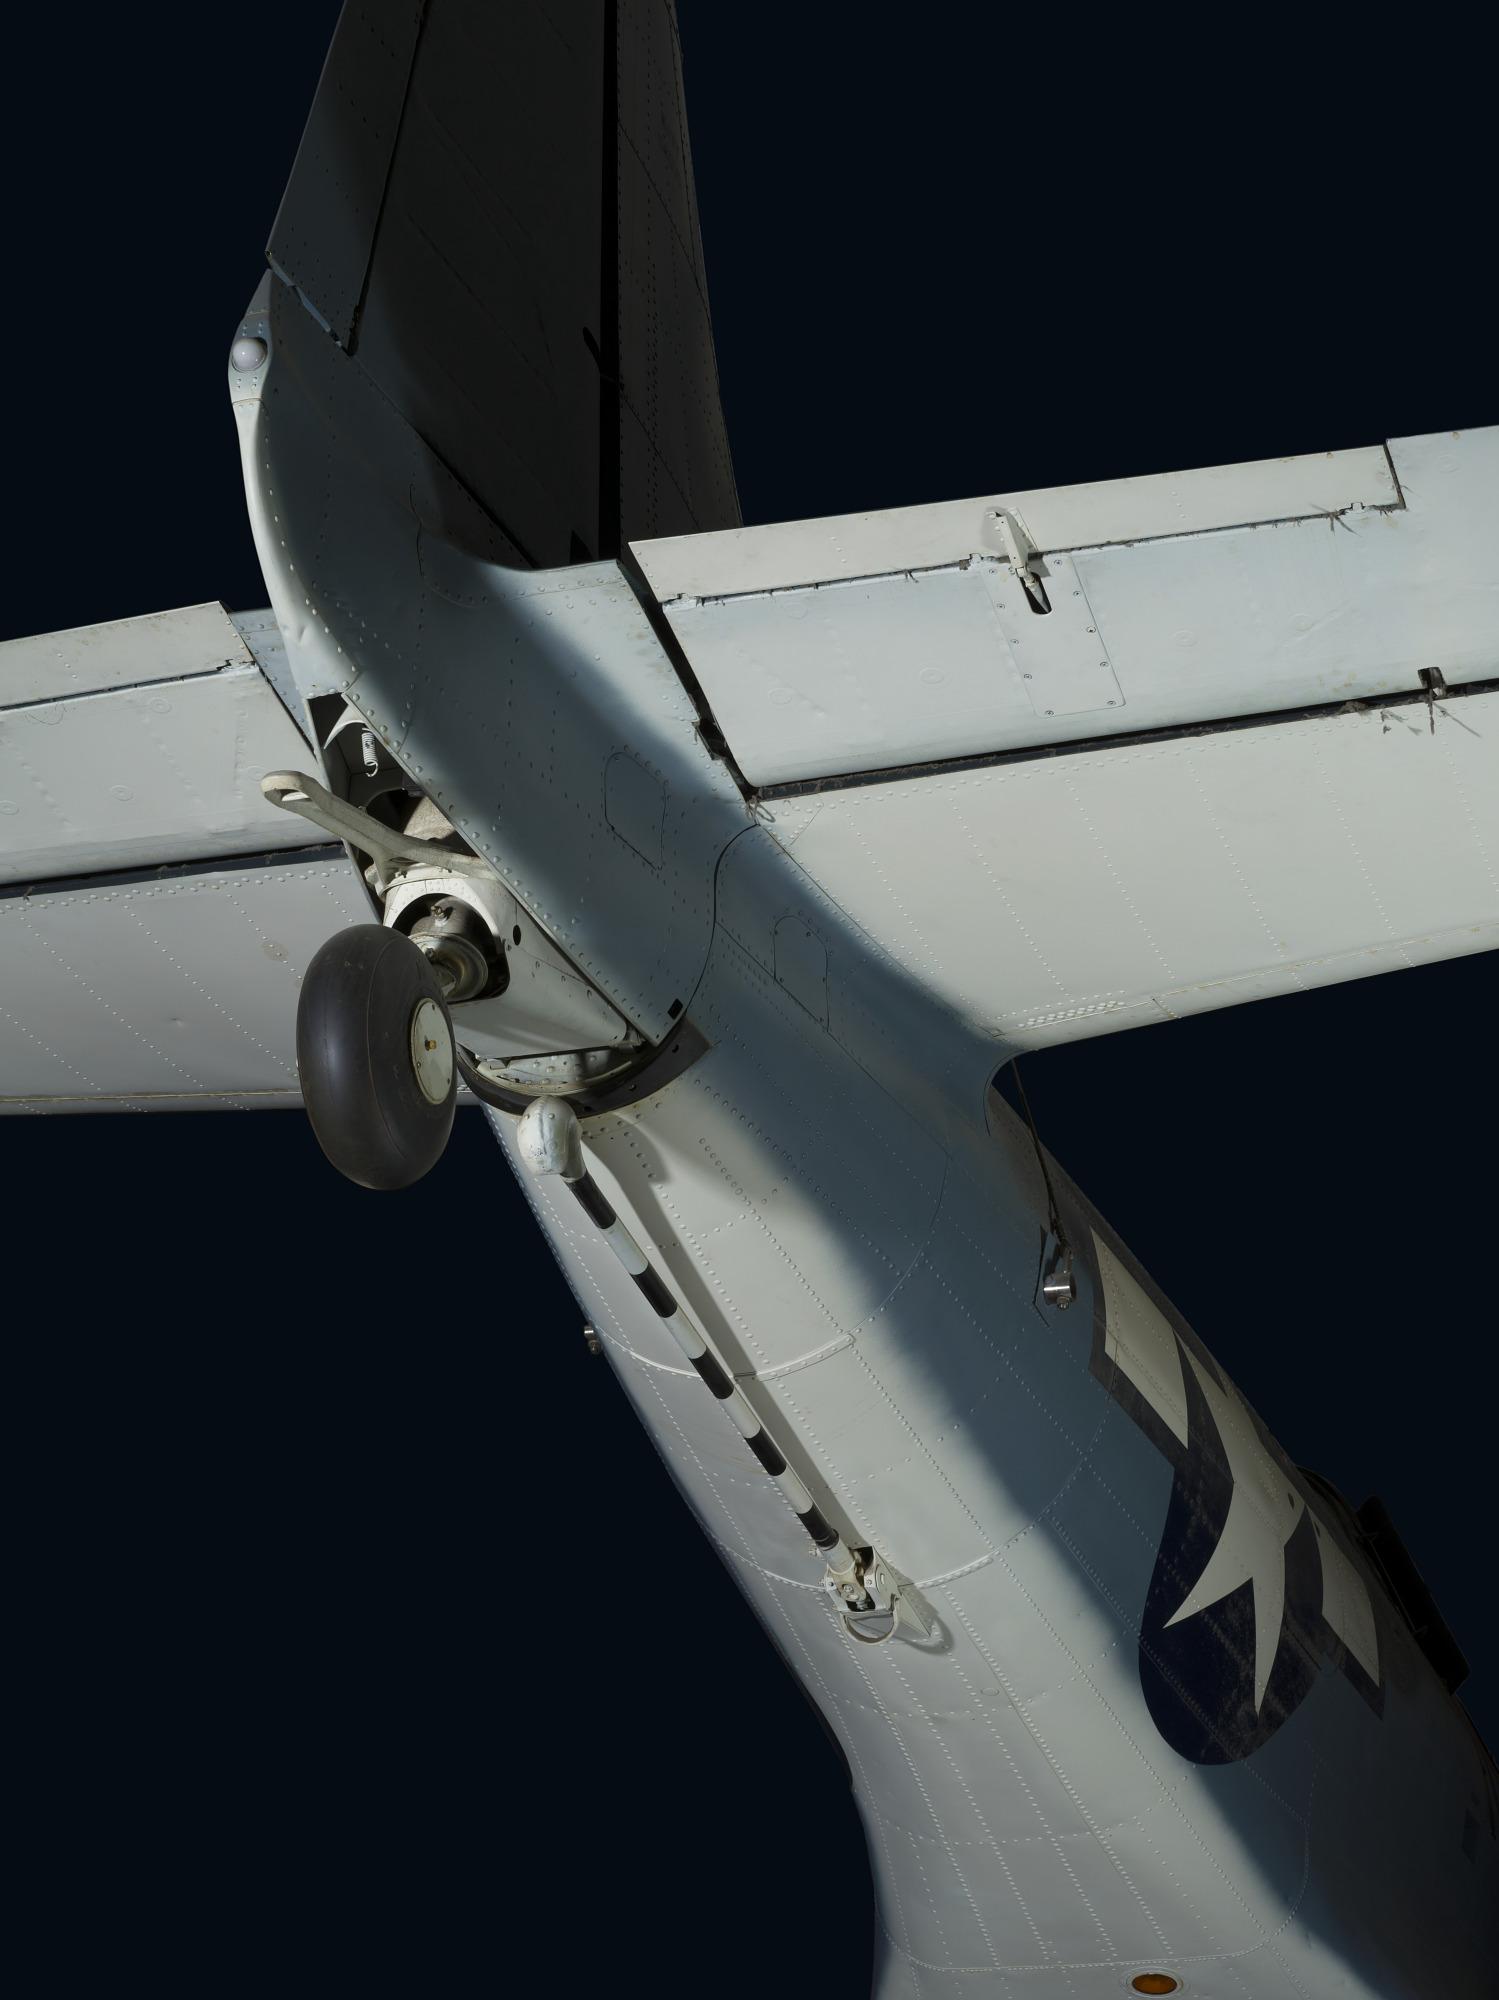 Douglas SBD-6 Dauntless   National Air and Space Museum